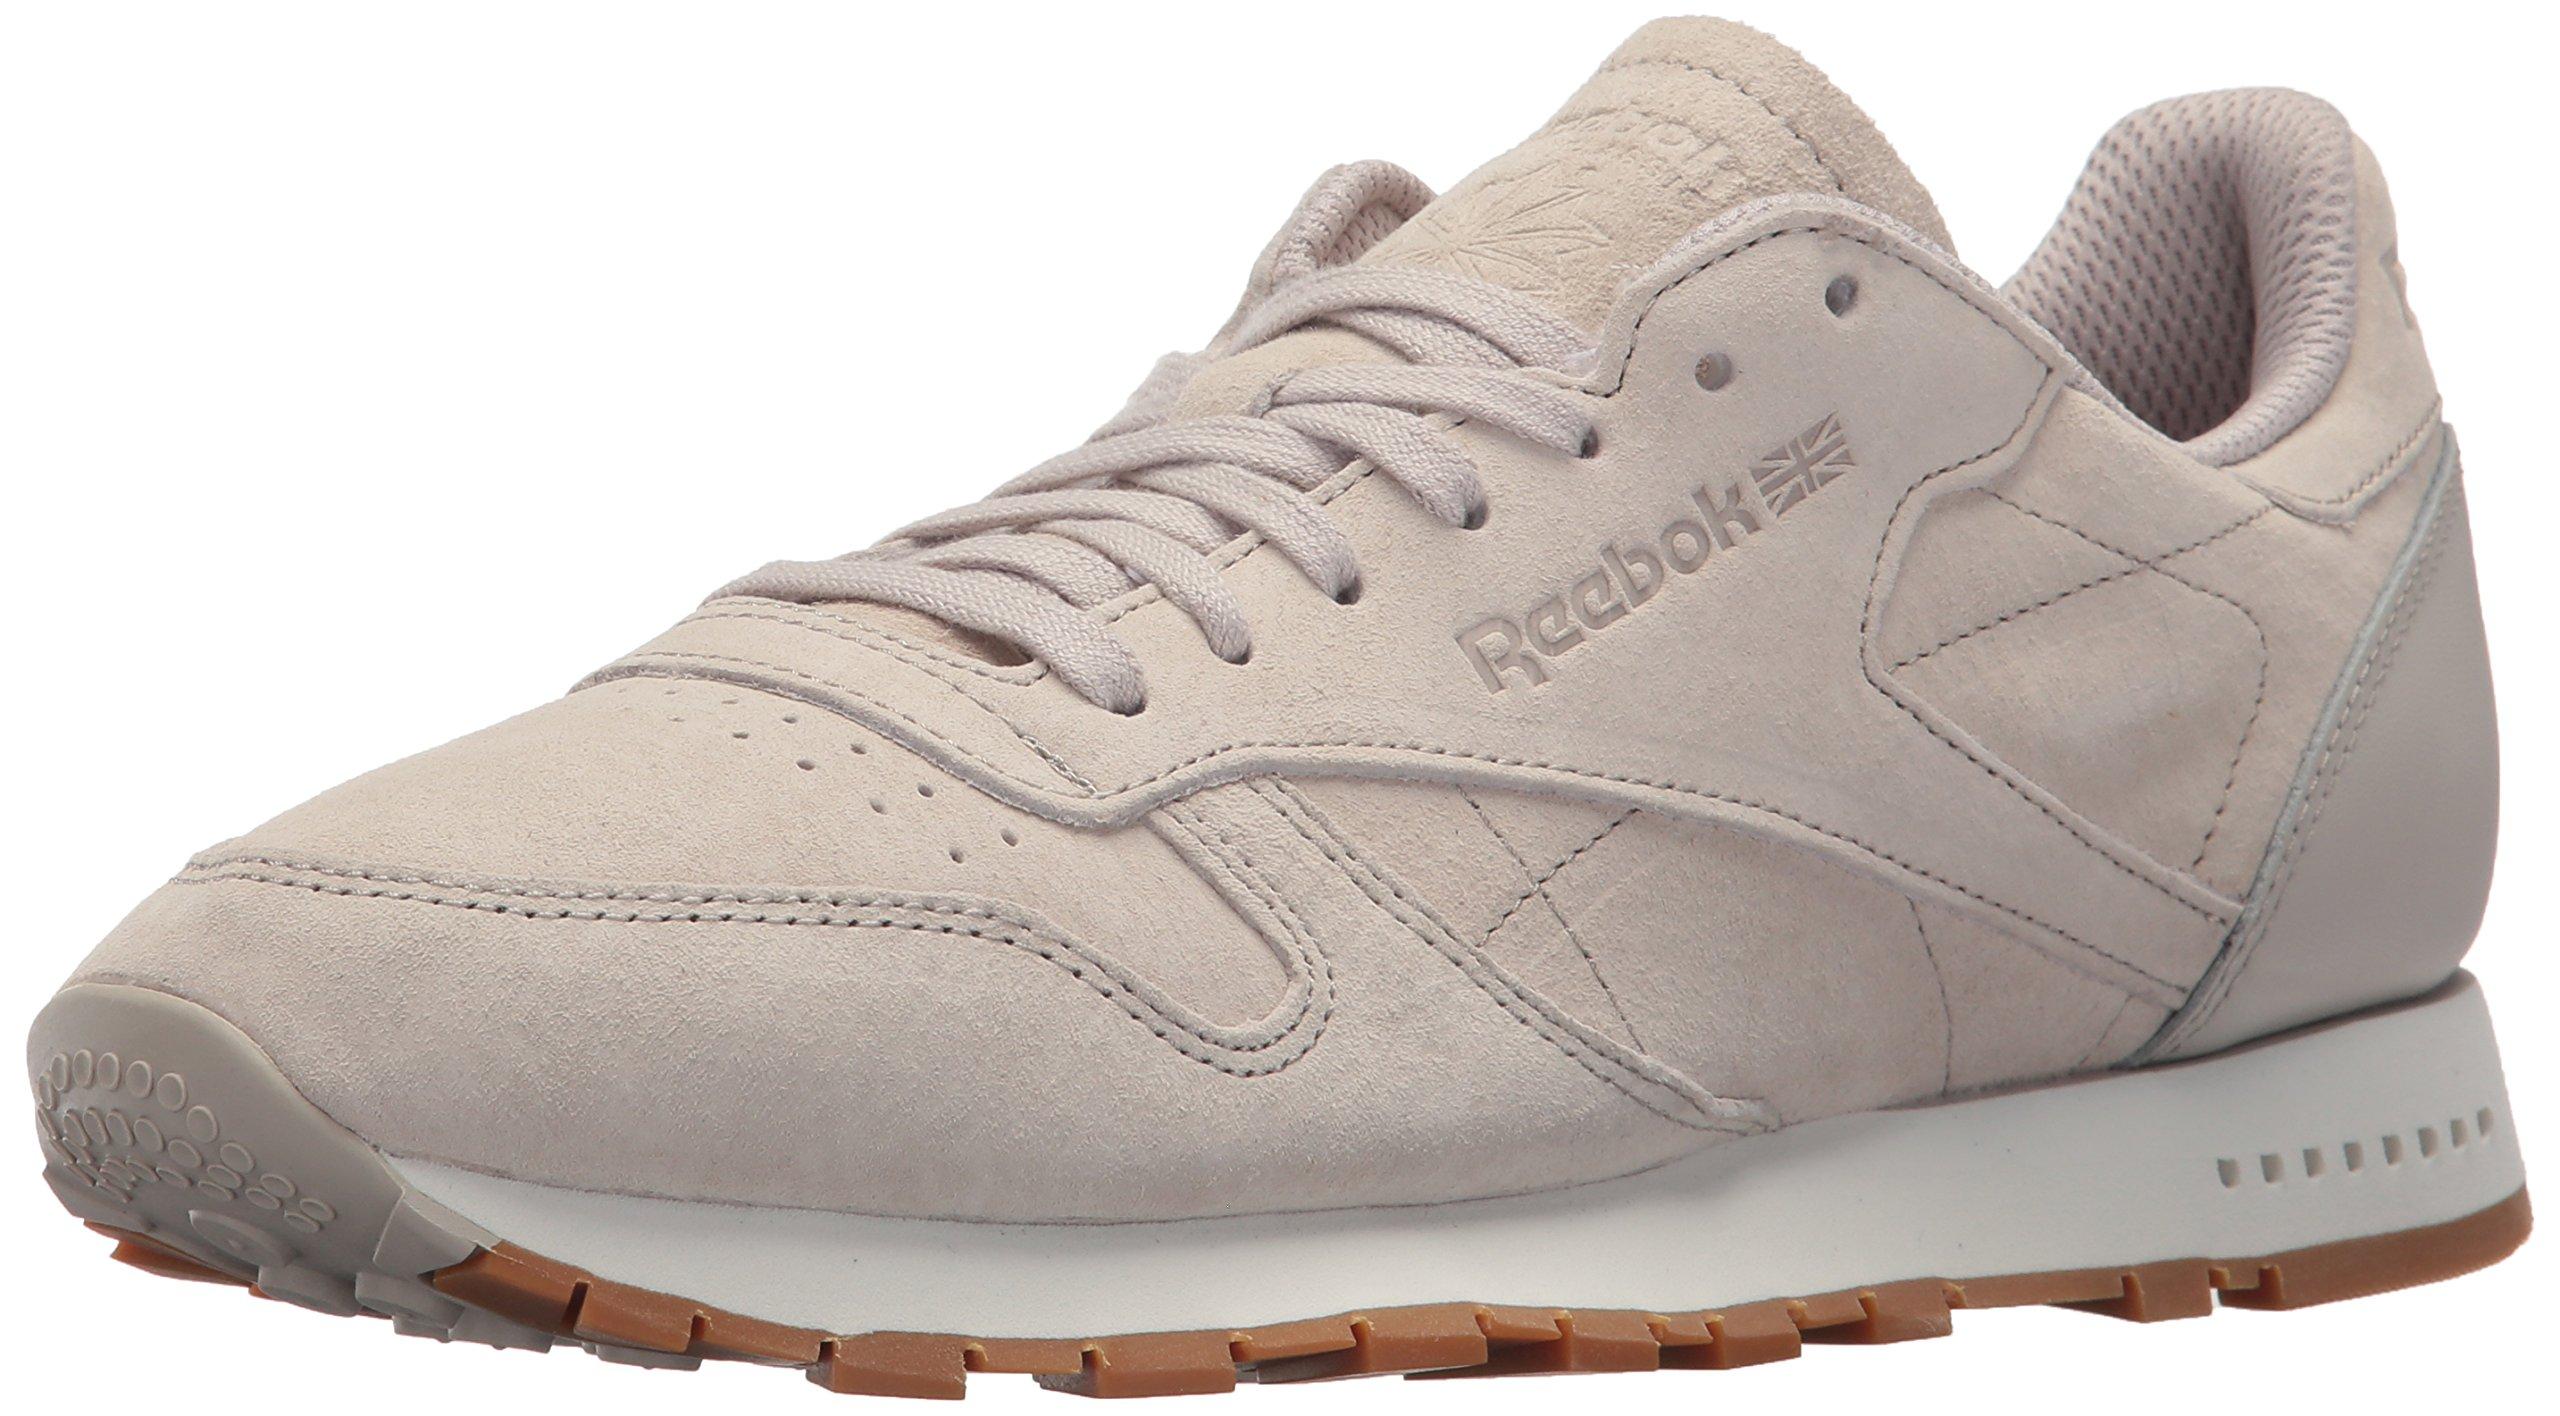 054dede579e7d Galleon - Reebok Men s CL Leather SG Sneaker